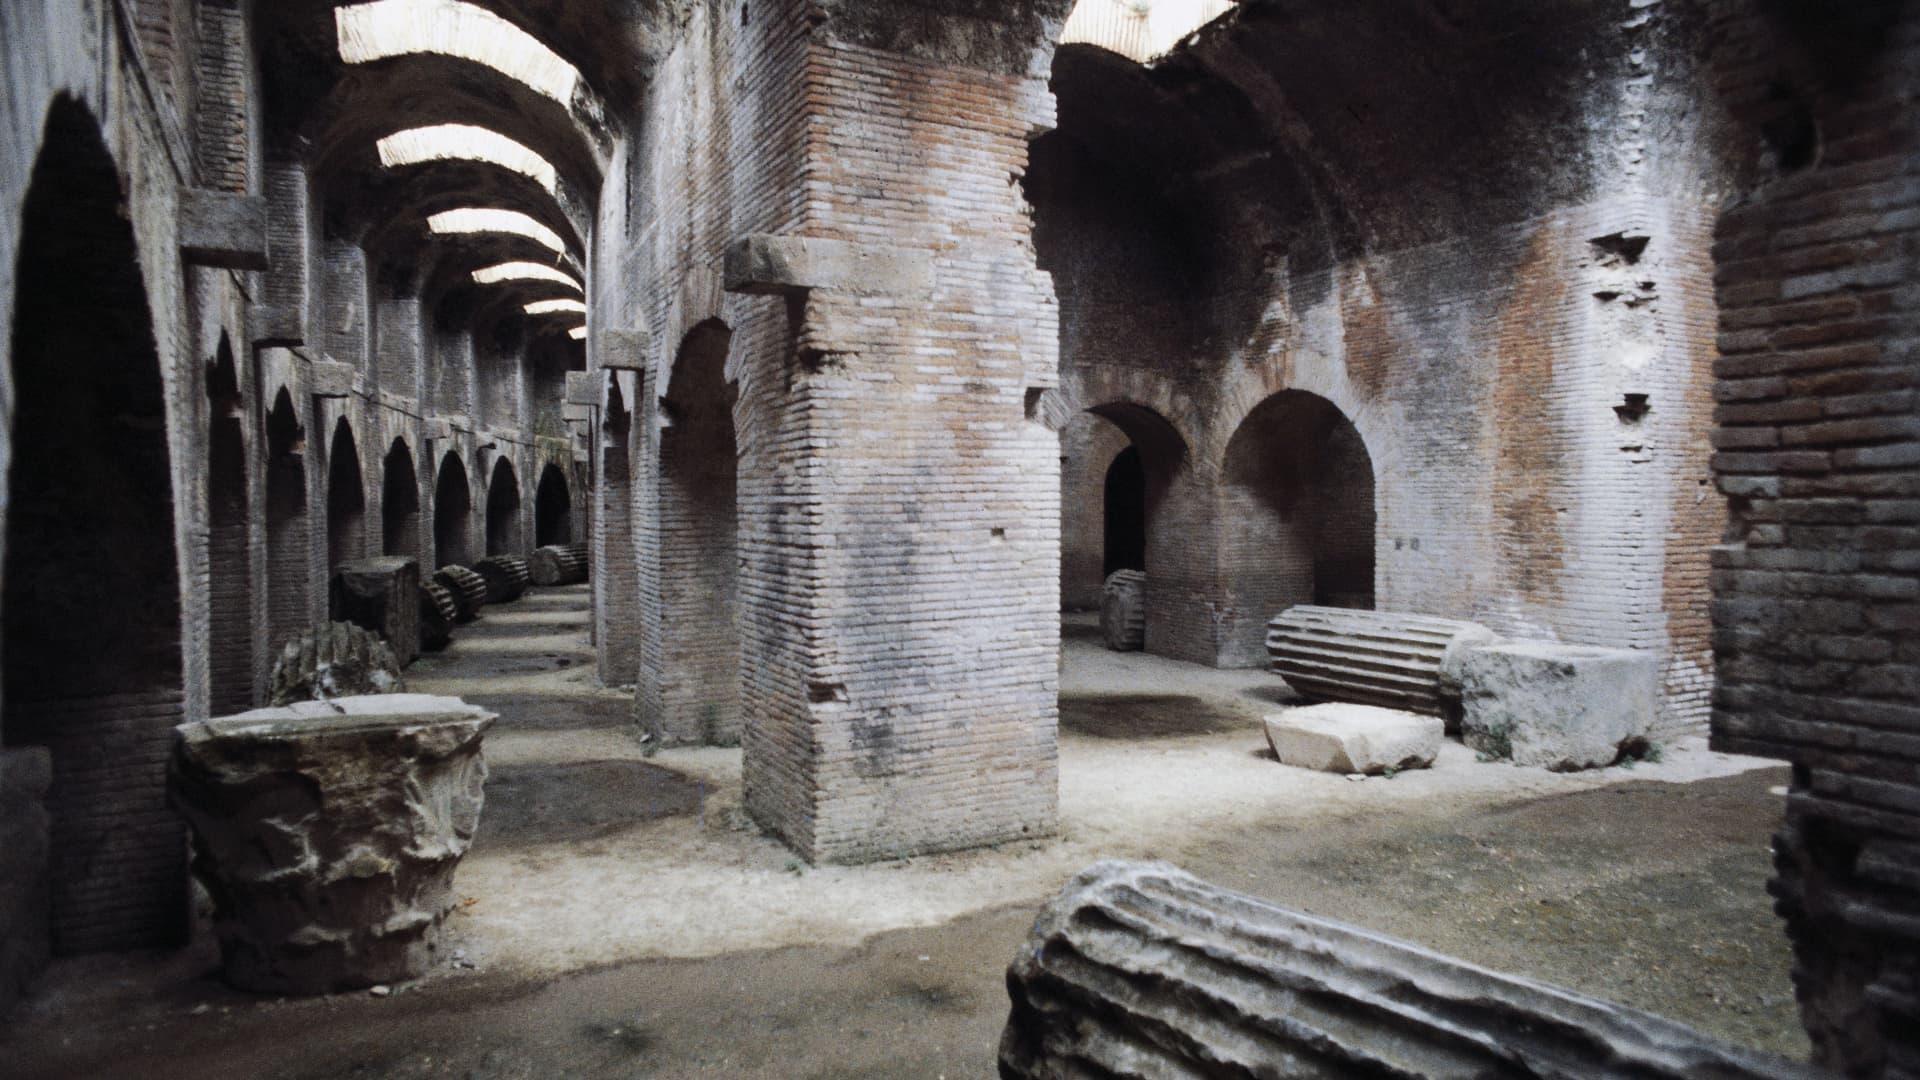 The underground passageways of the Flavian Amphitheatre in Pozzuoli, Italy.